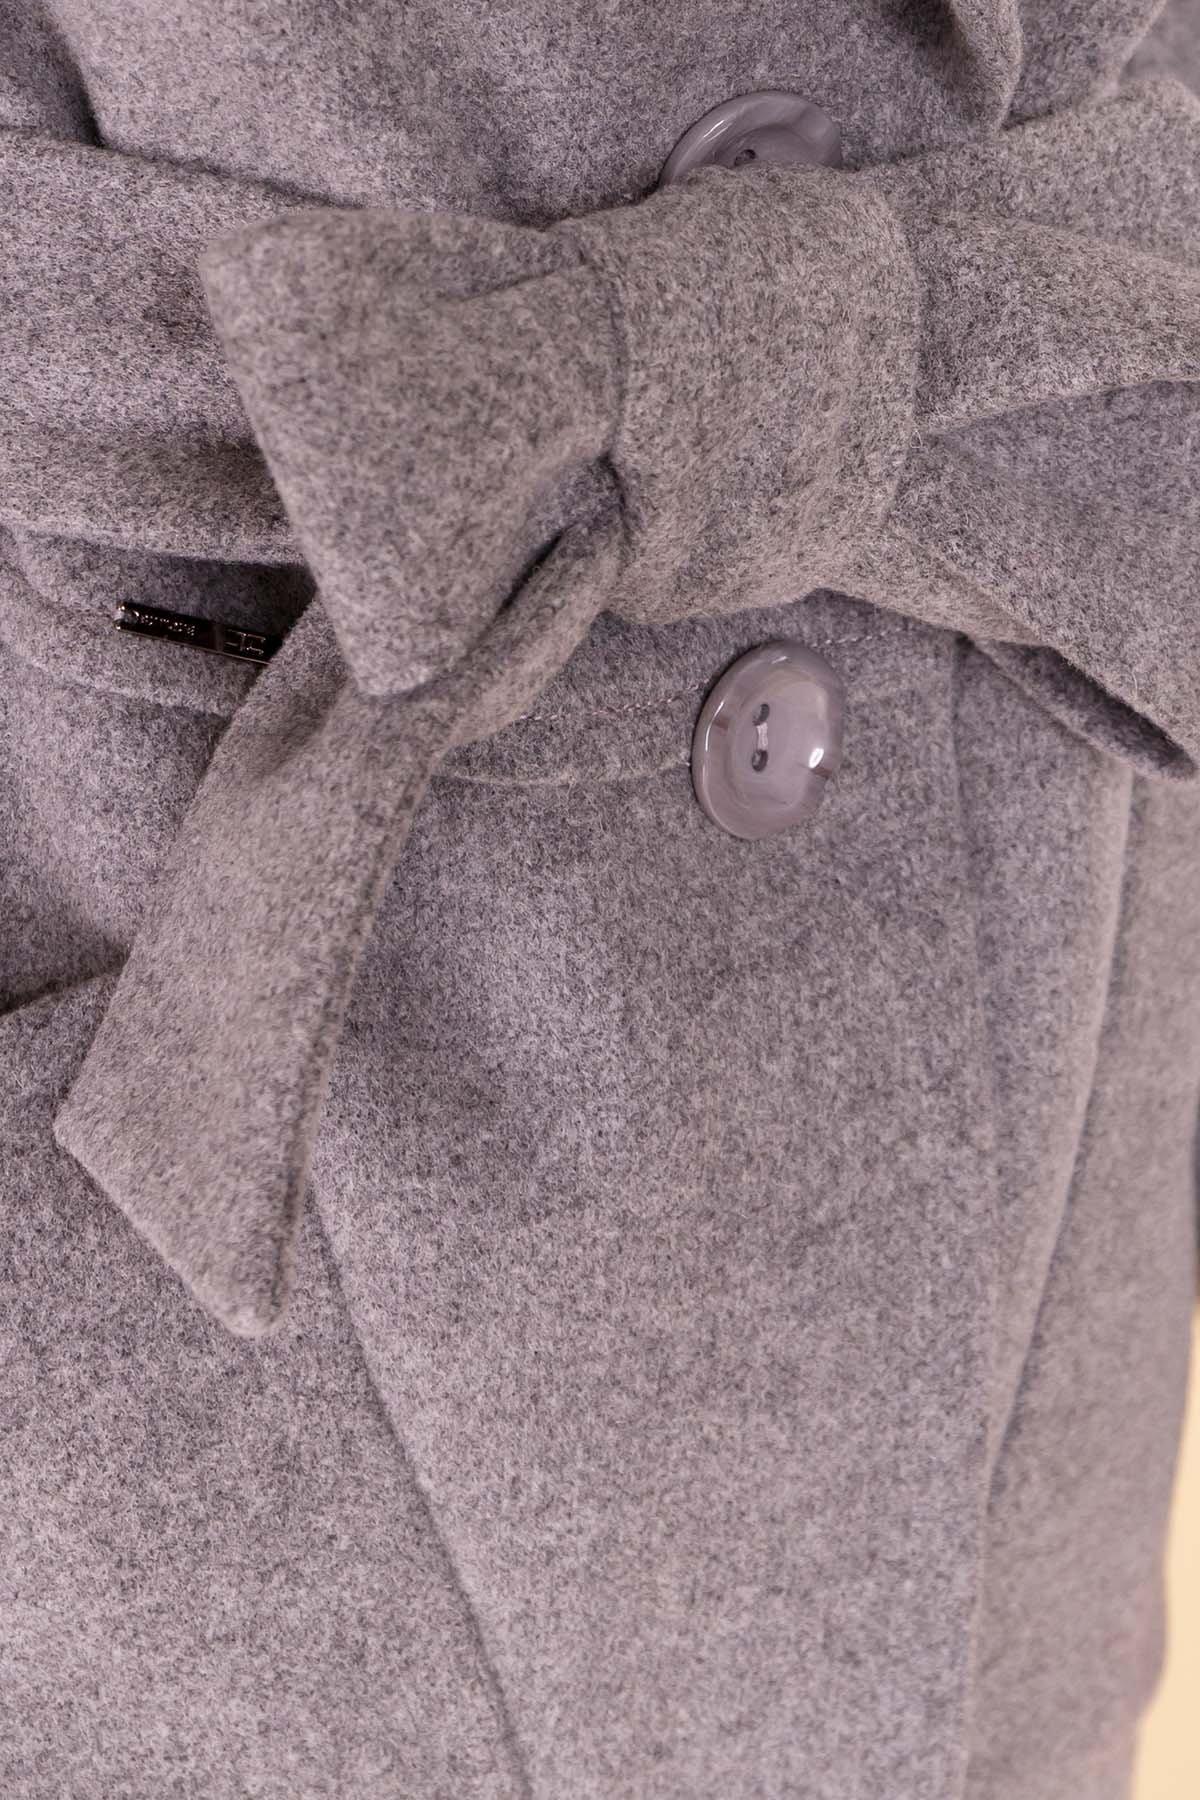 Пальто Габриэлла 4417 АРТ. 21204 Цвет: Серый 18 - фото 6, интернет магазин tm-modus.ru